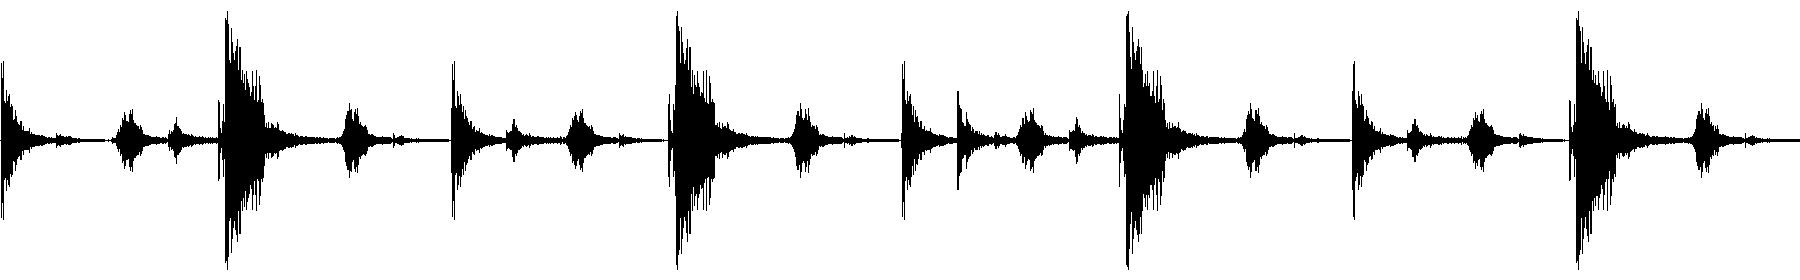 ehu liveperc125 002